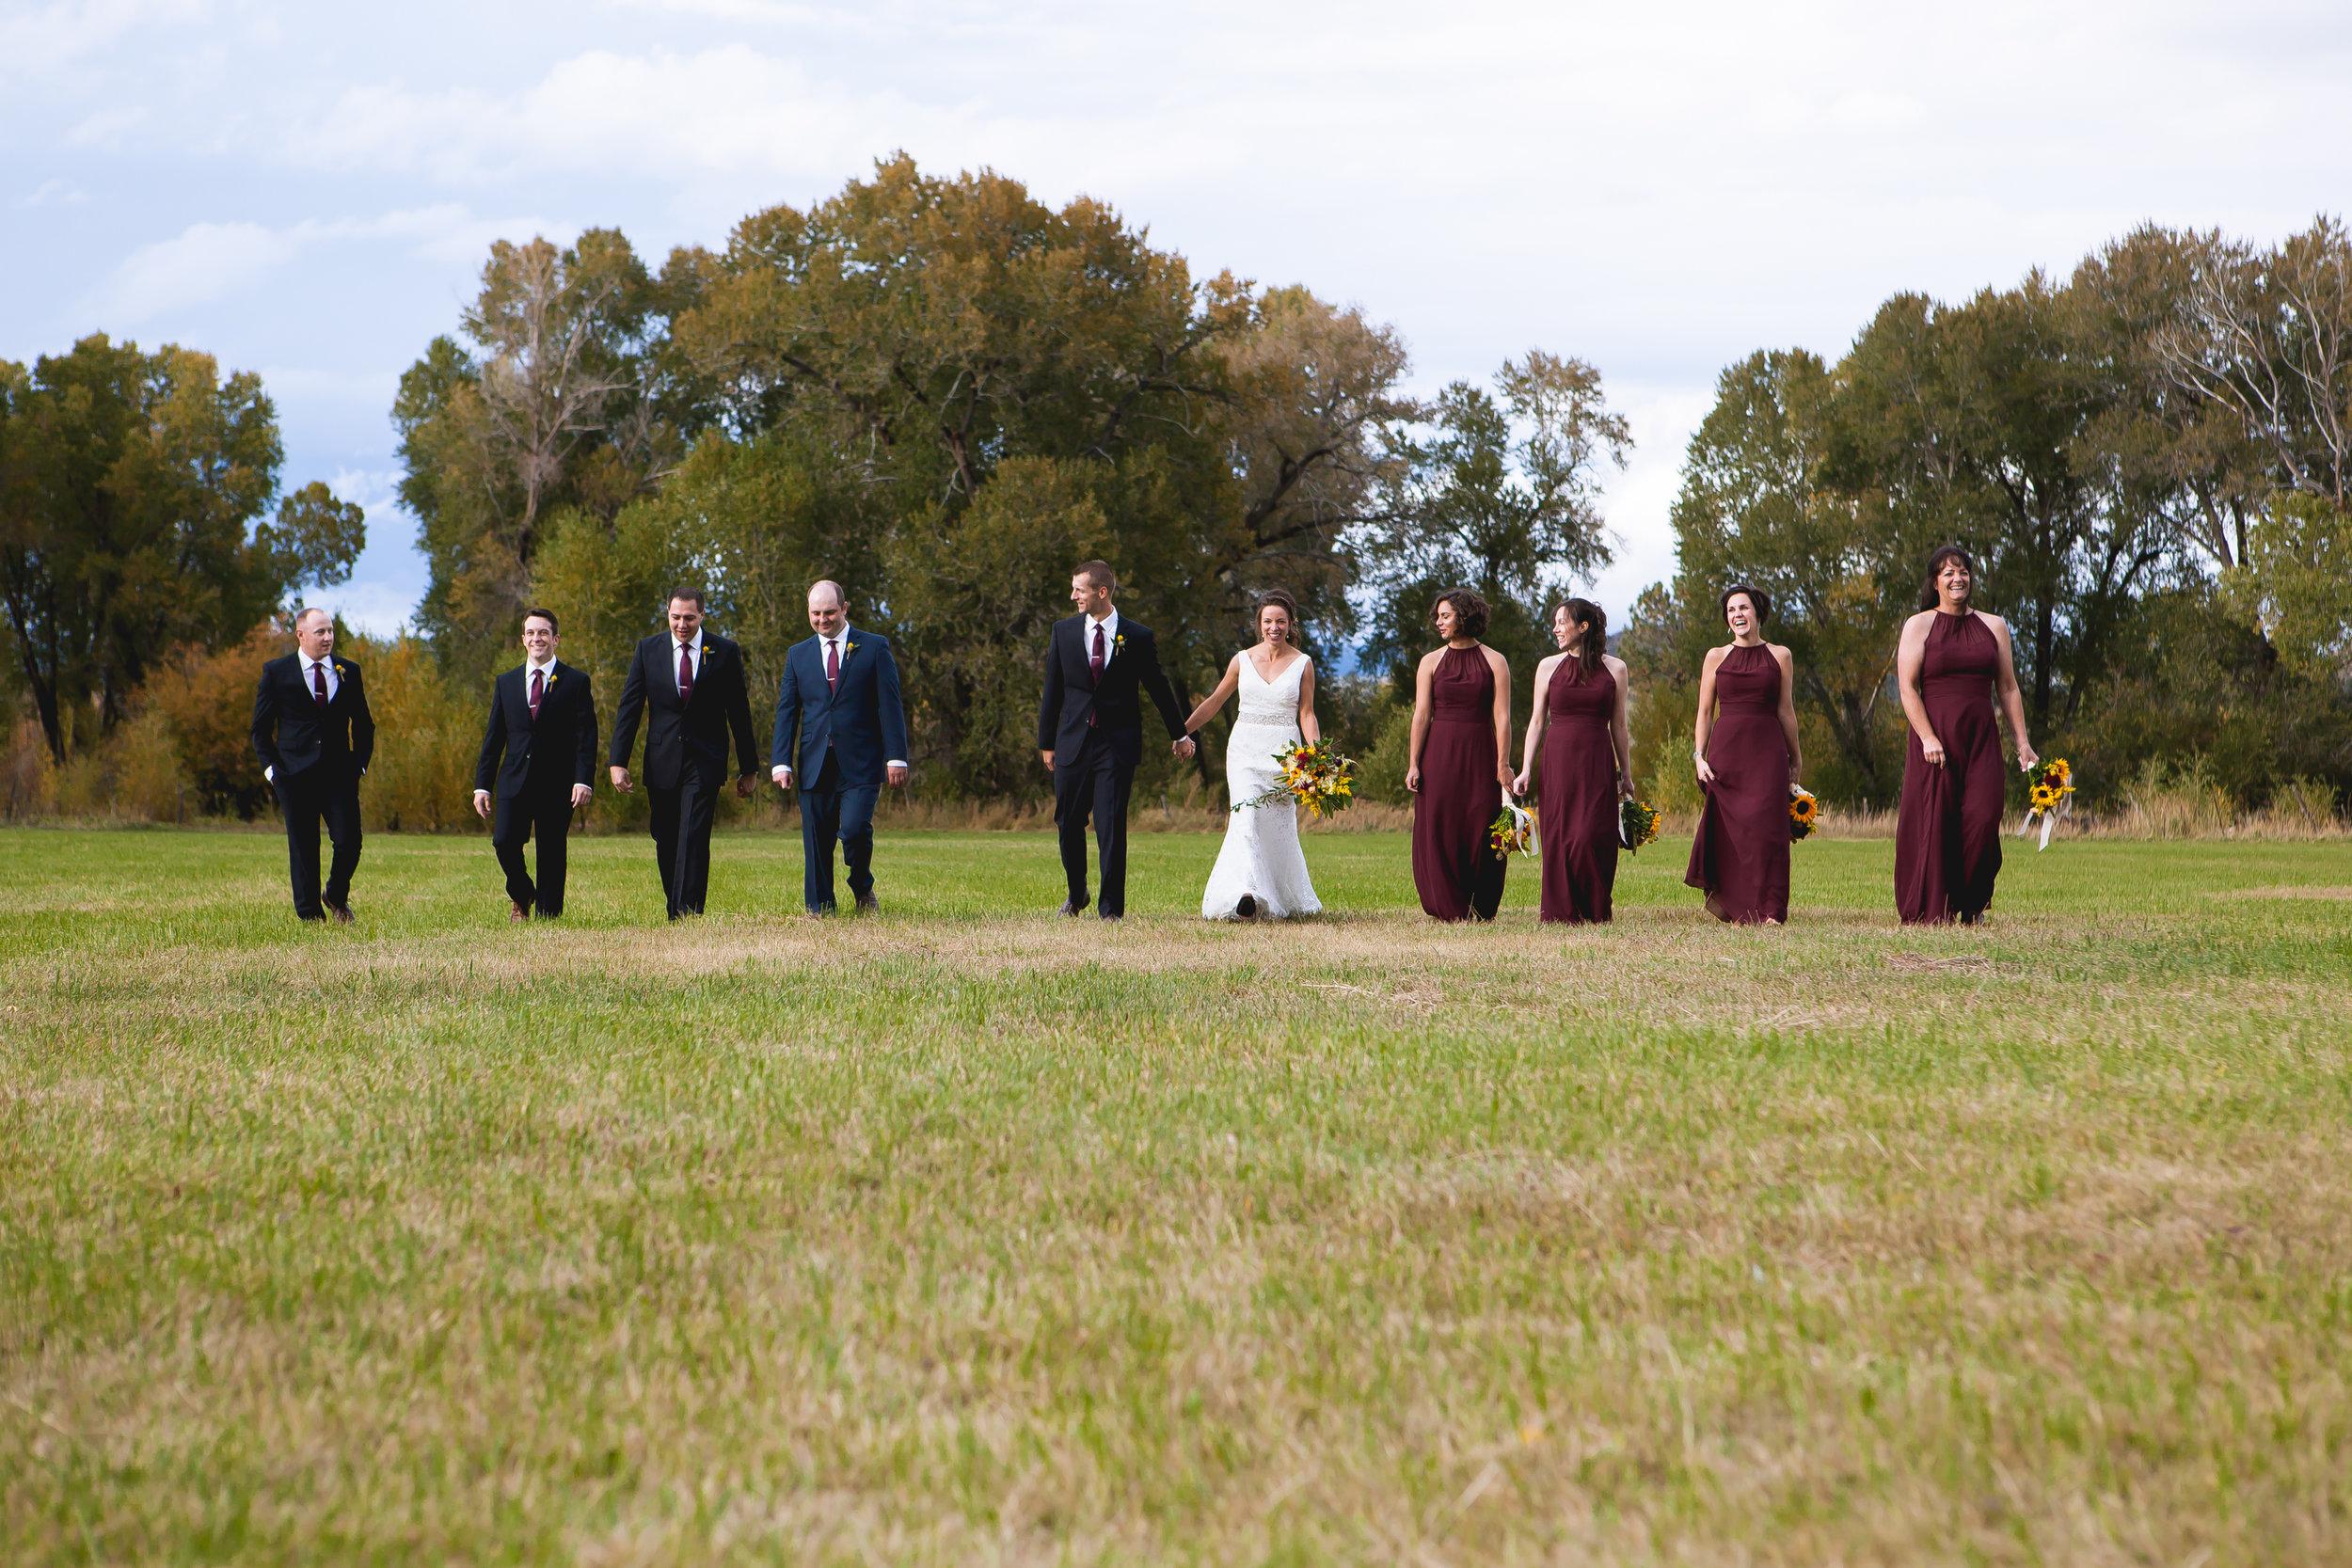 La Platts Pond wedding